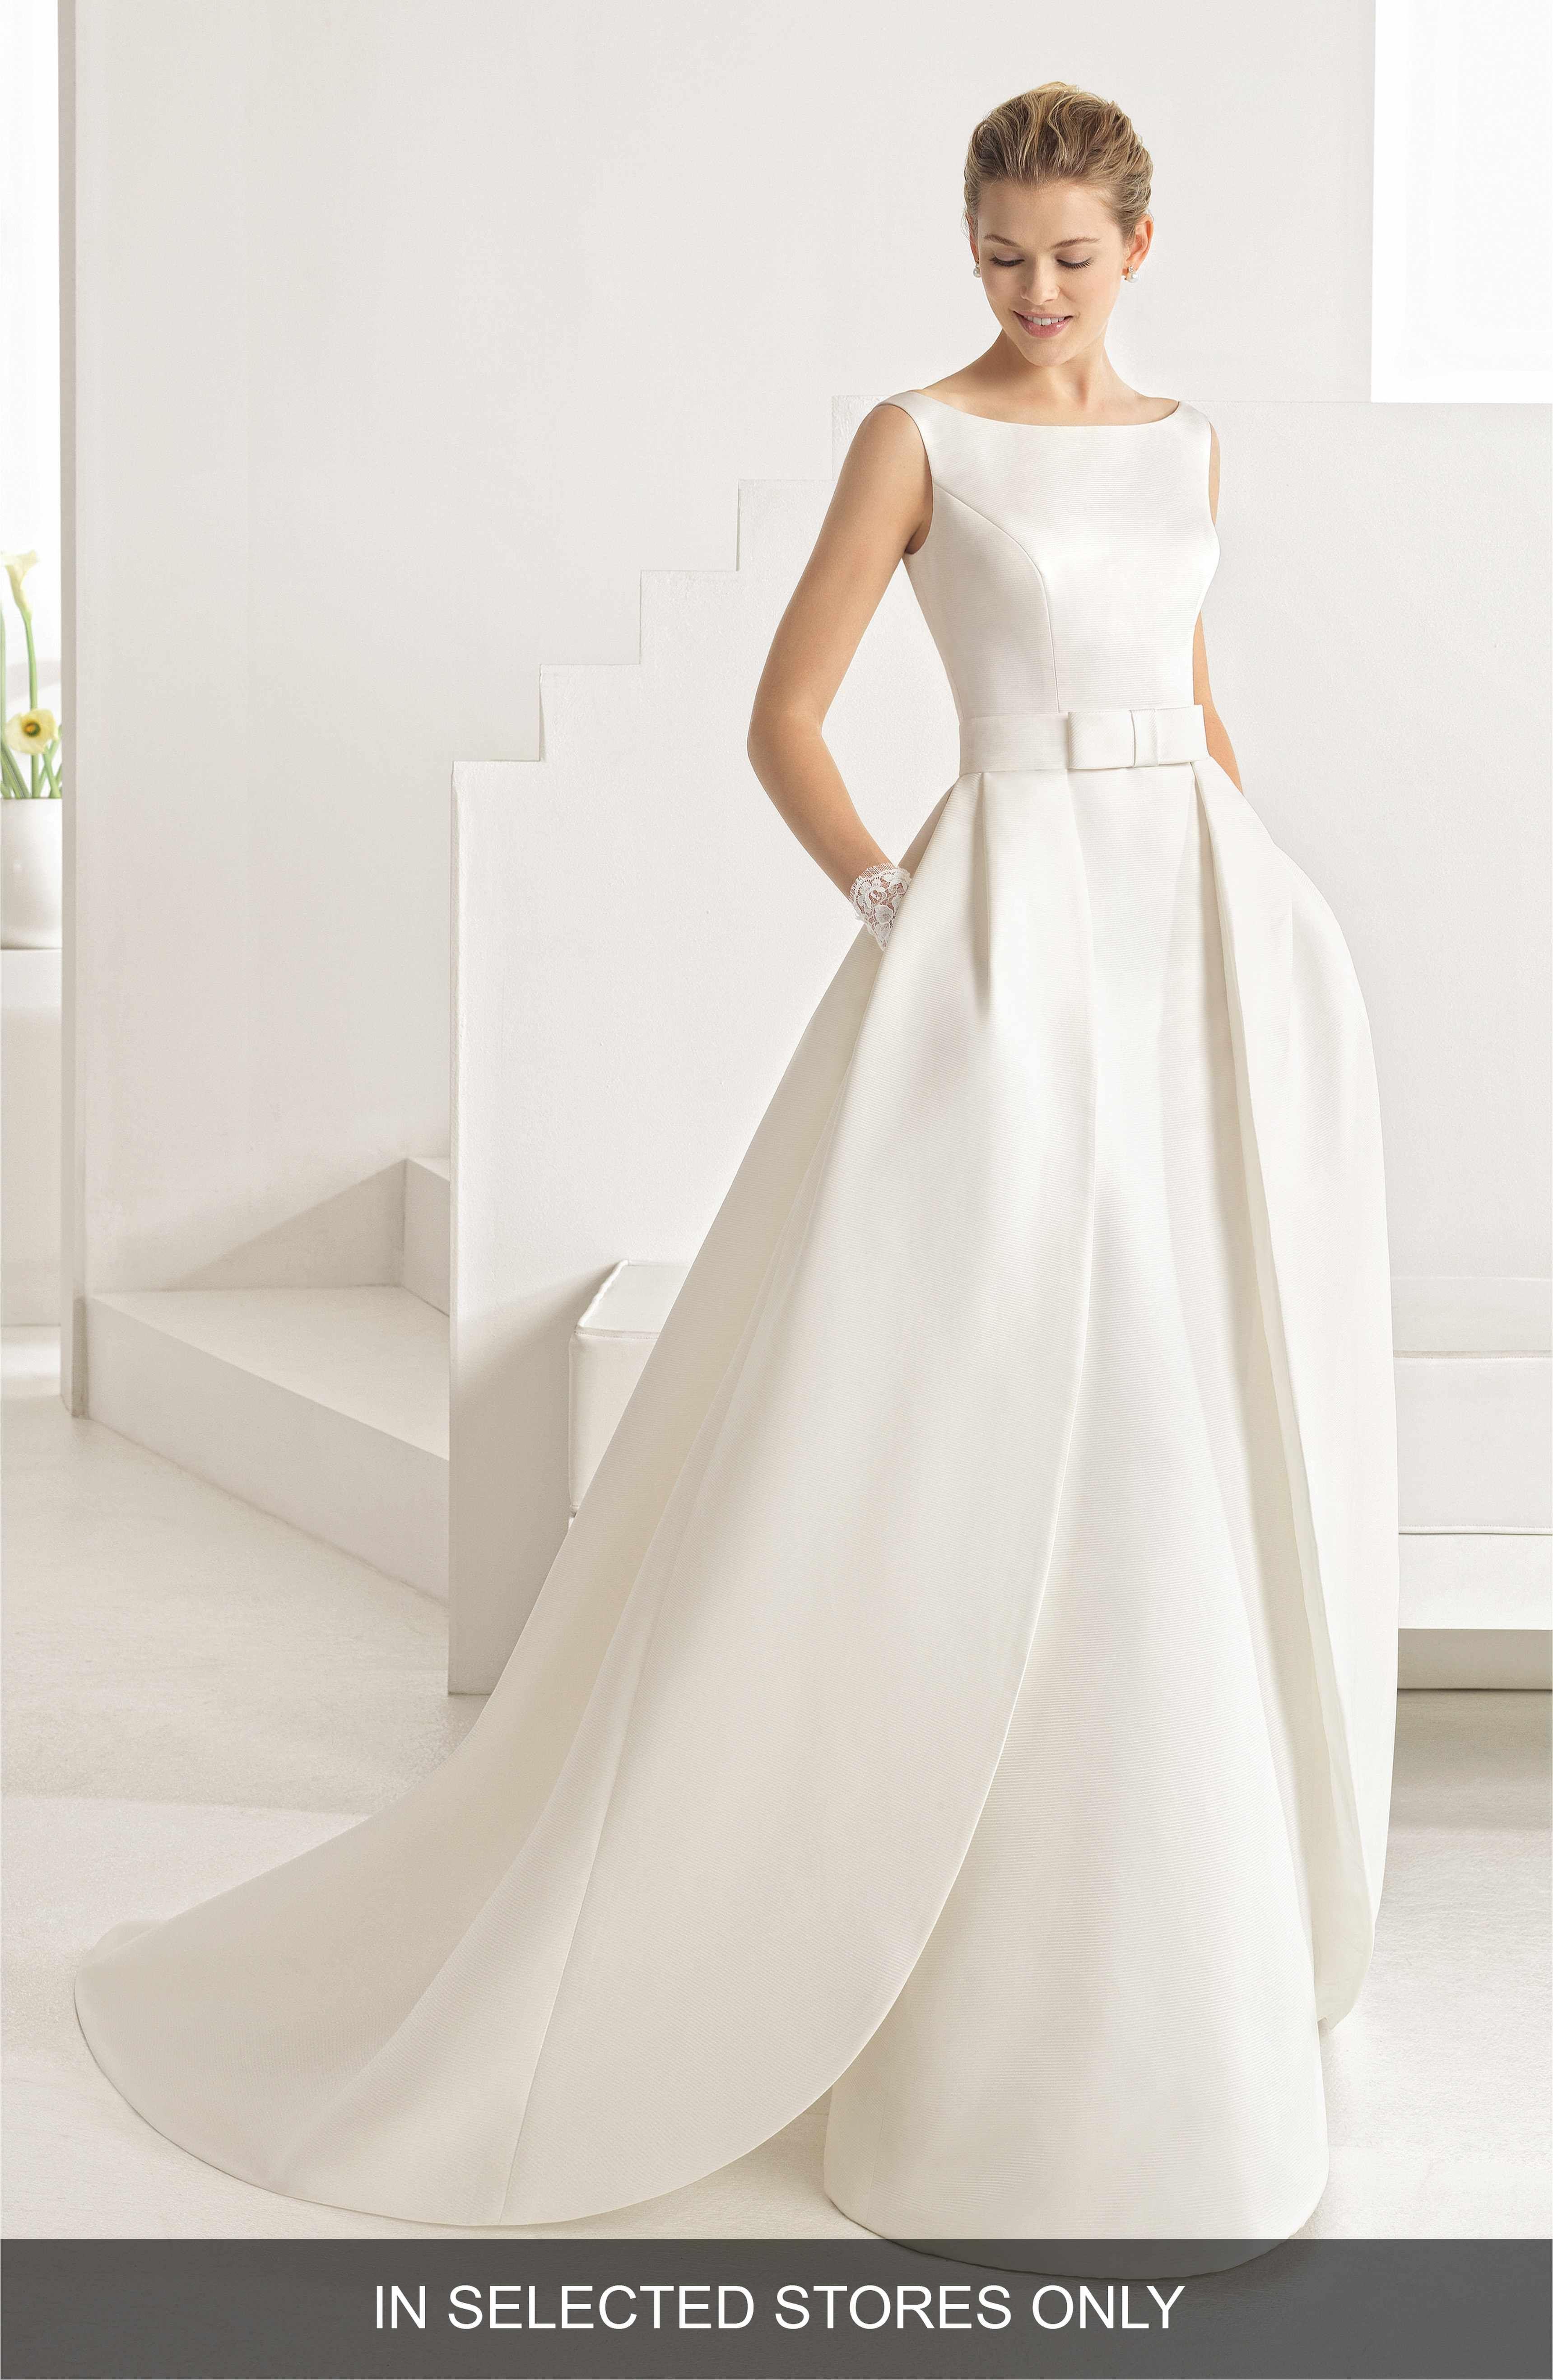 27+ Rosa clara wedding dresses near me ideas in 2021